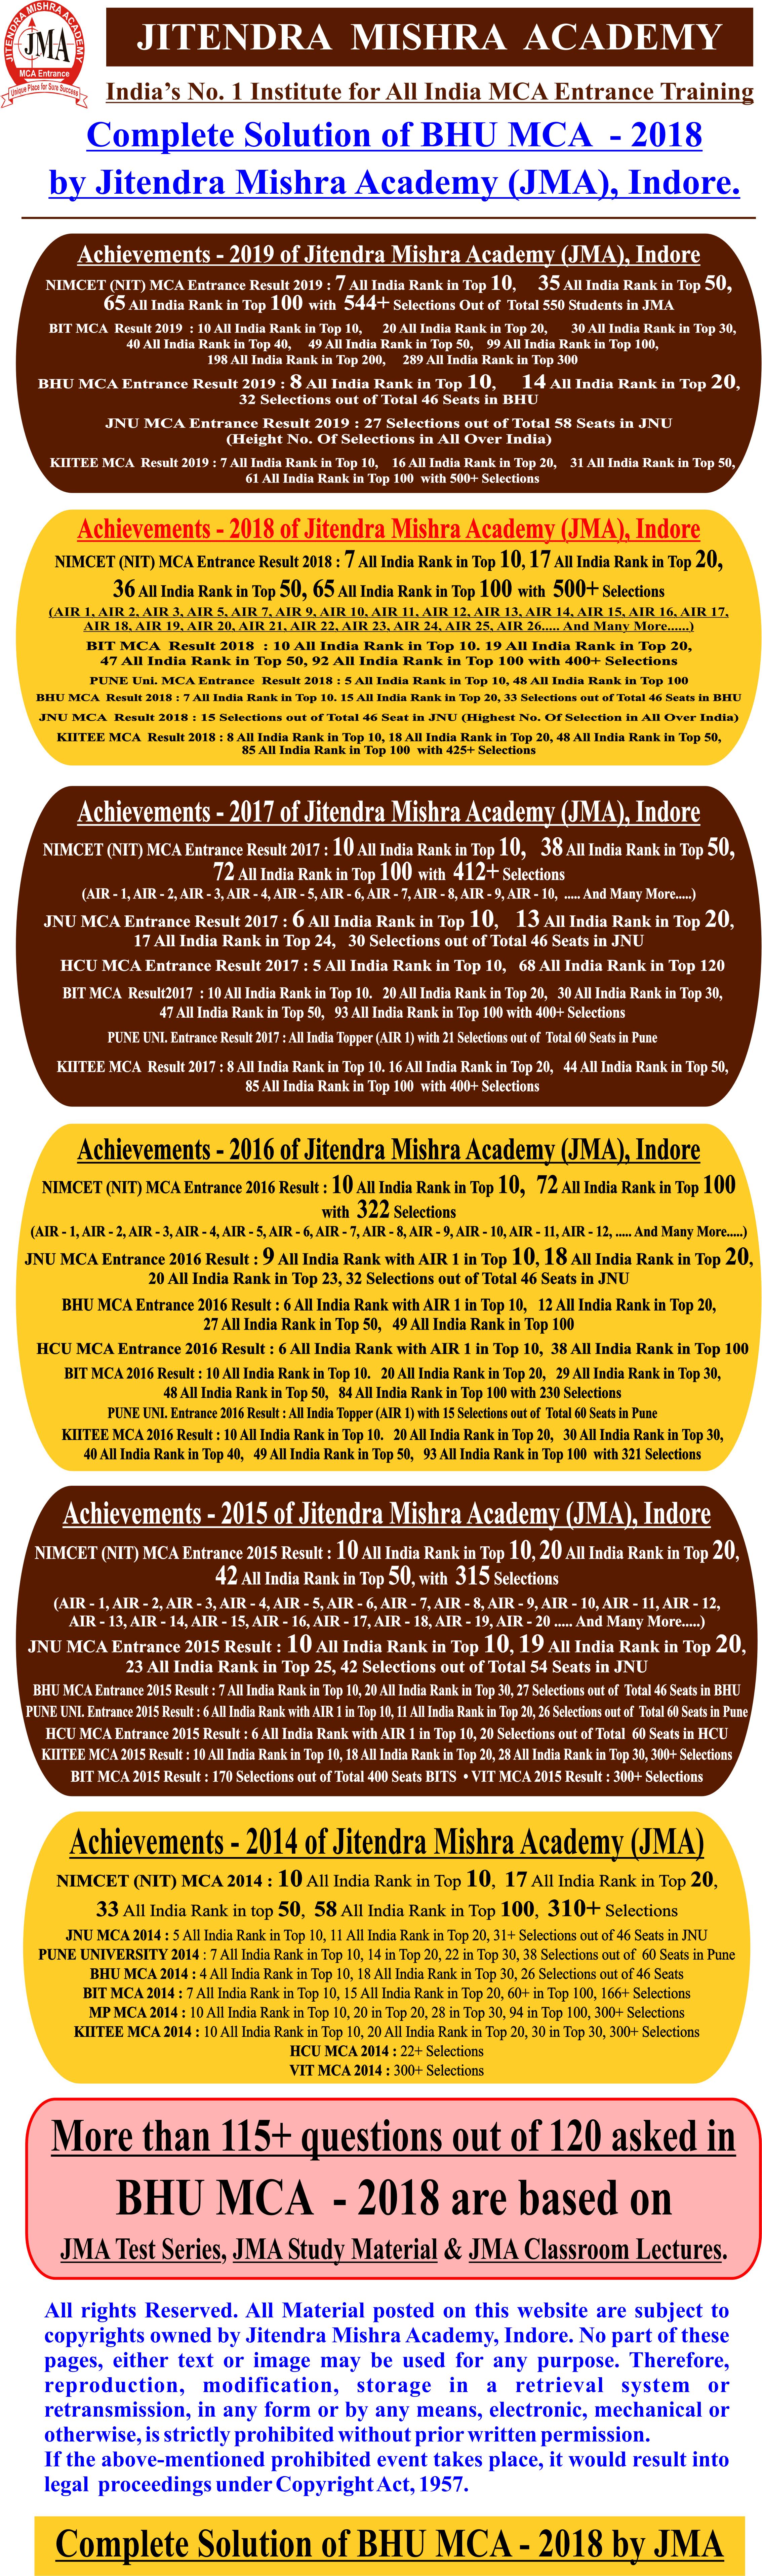 1BHU MCA - 2018 (SOLUTION).